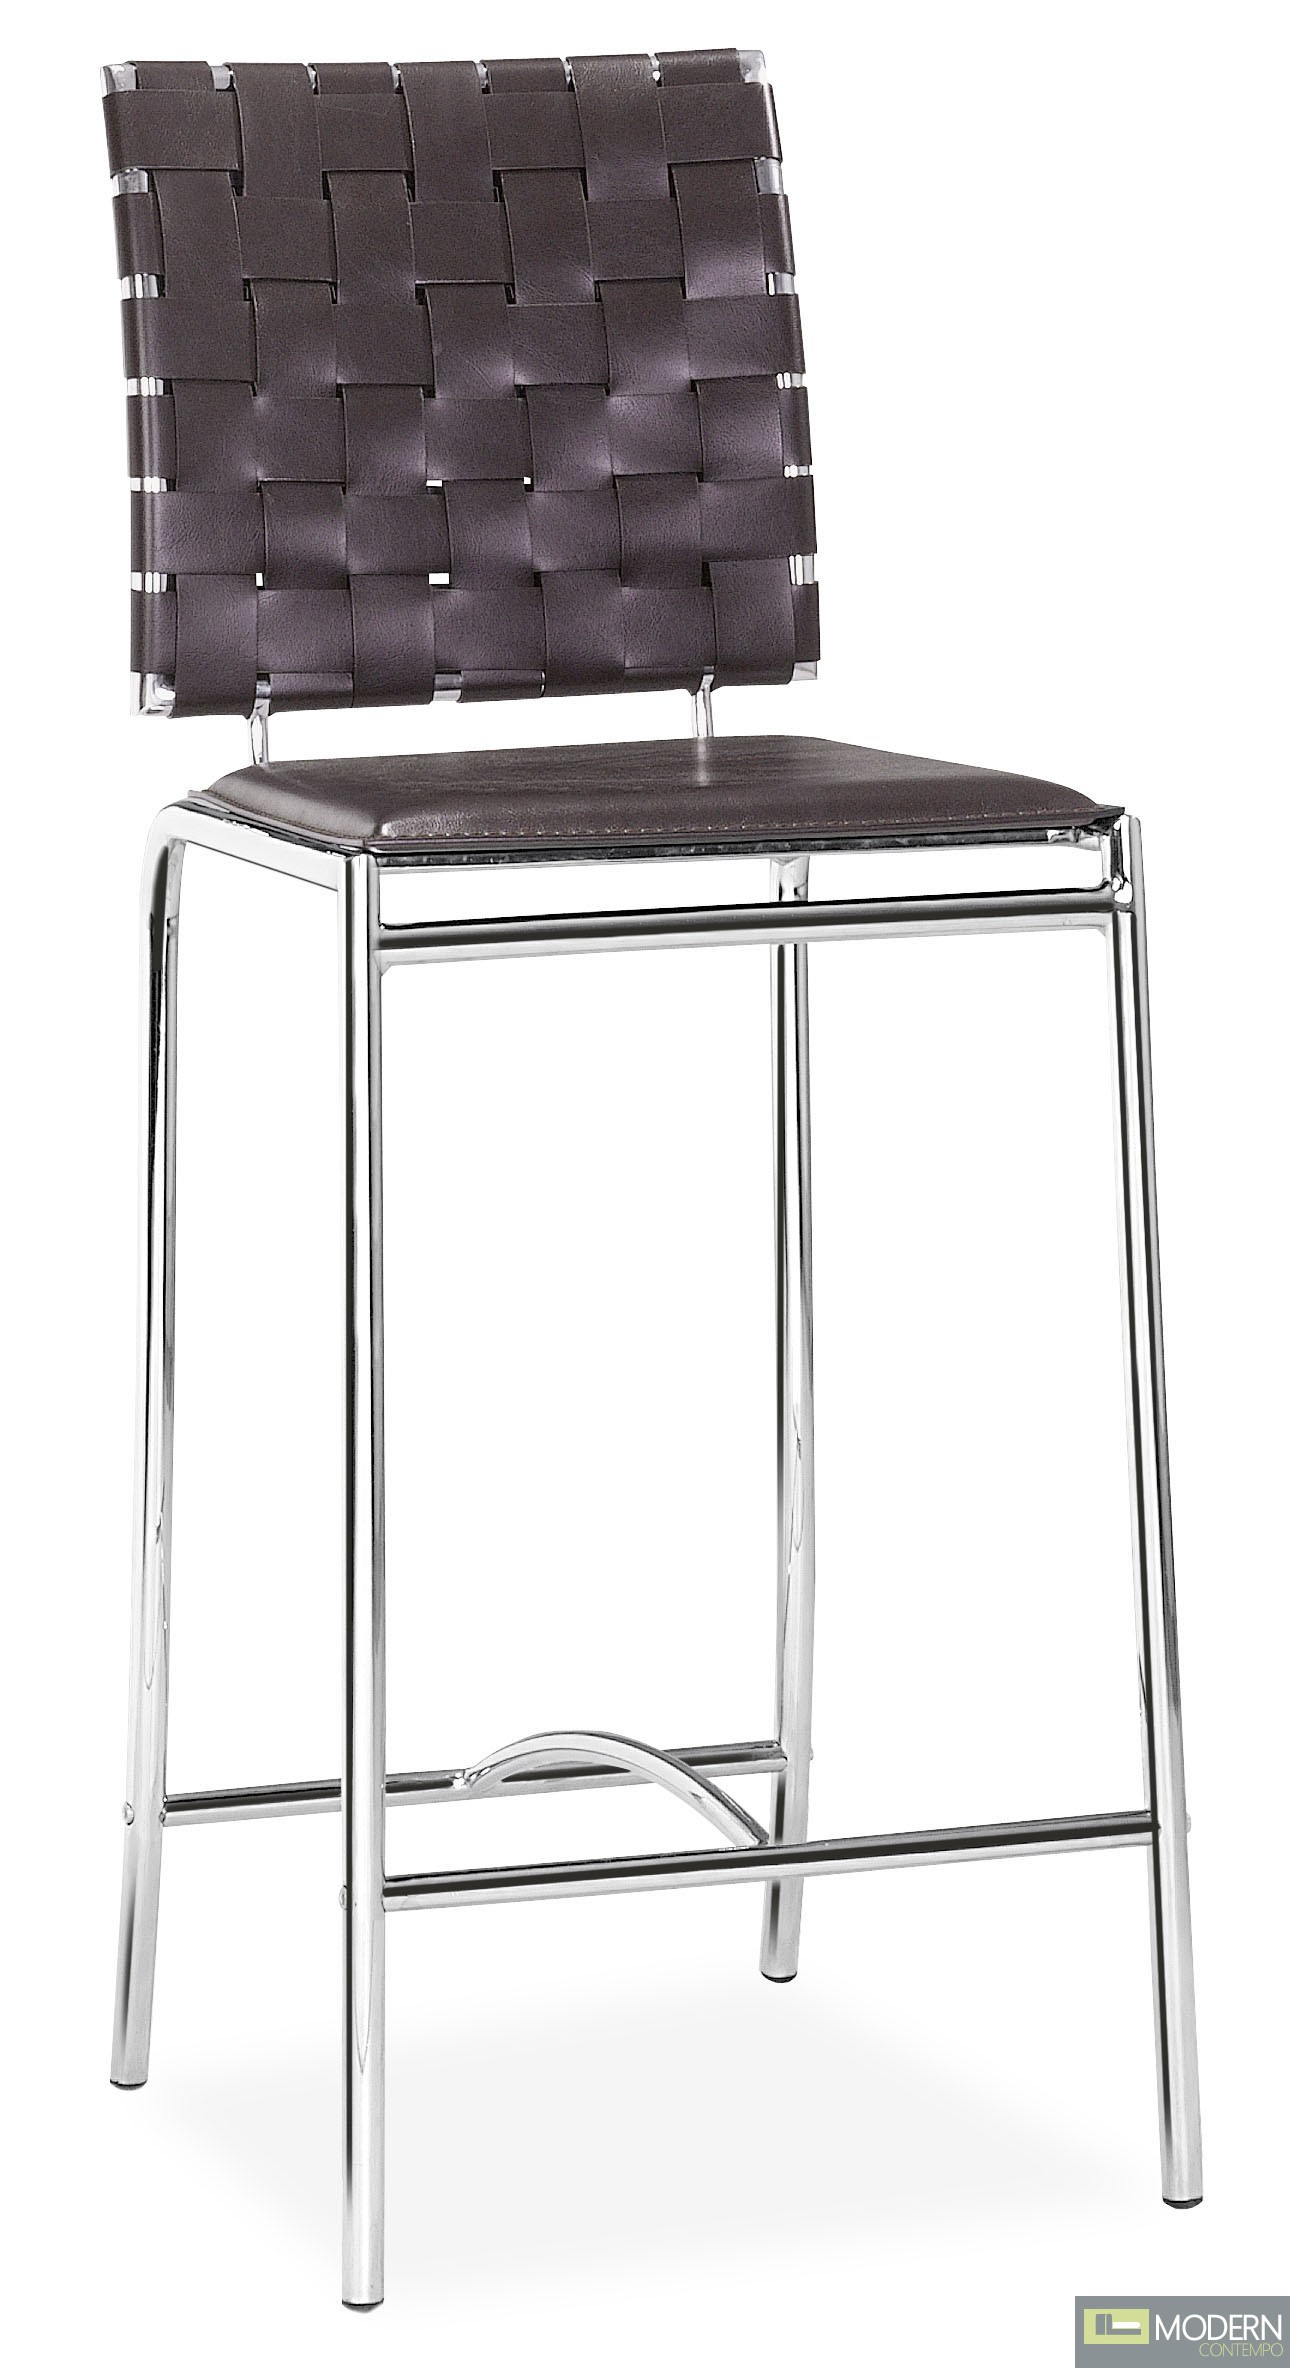 Criss Cross Counter Chair Espresso